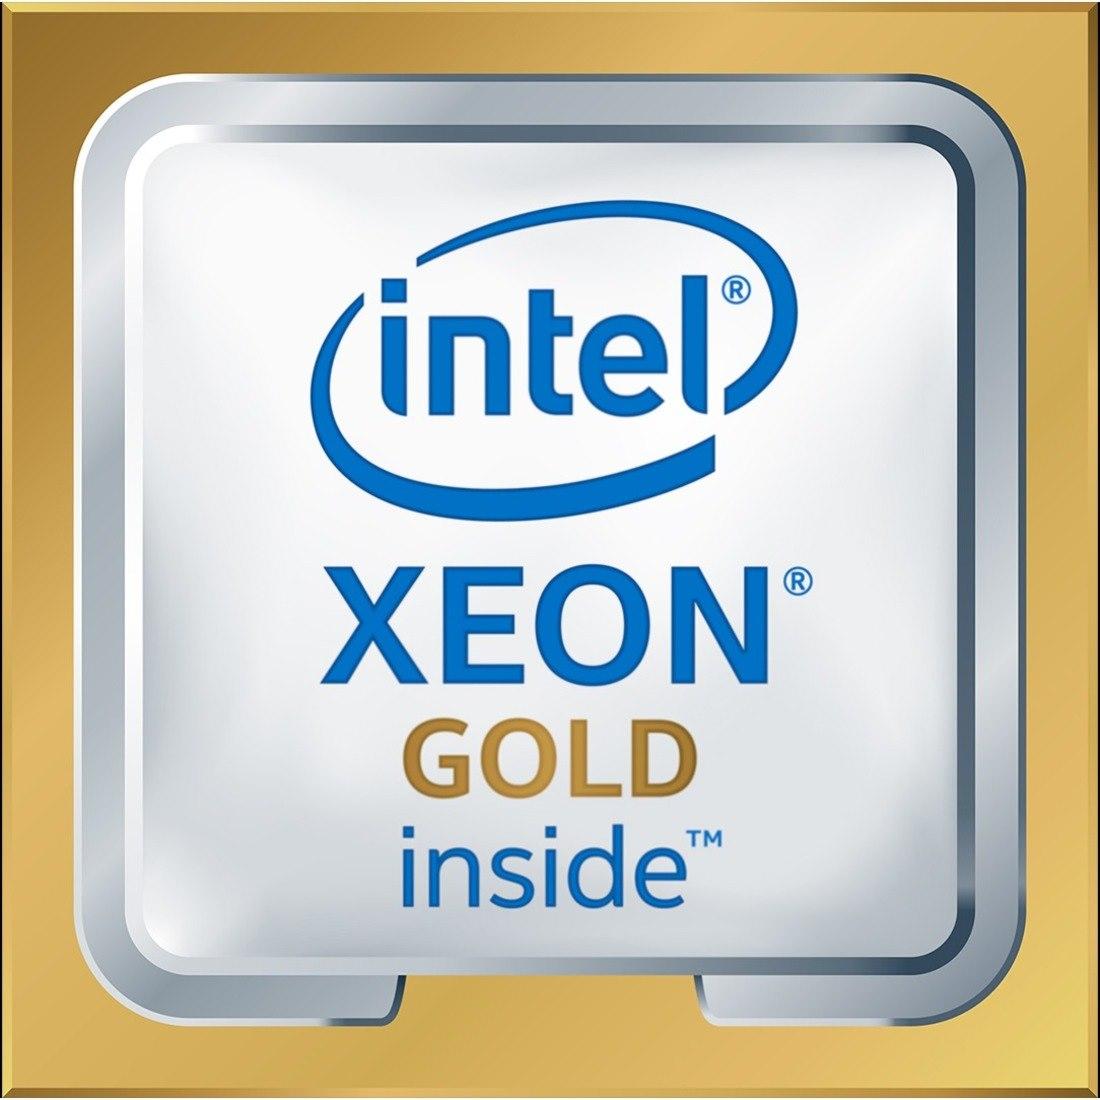 Cisco Intel Xeon Gold 6140 Octadeca-core (18 Core) 2.30 GHz Processor Upgrade